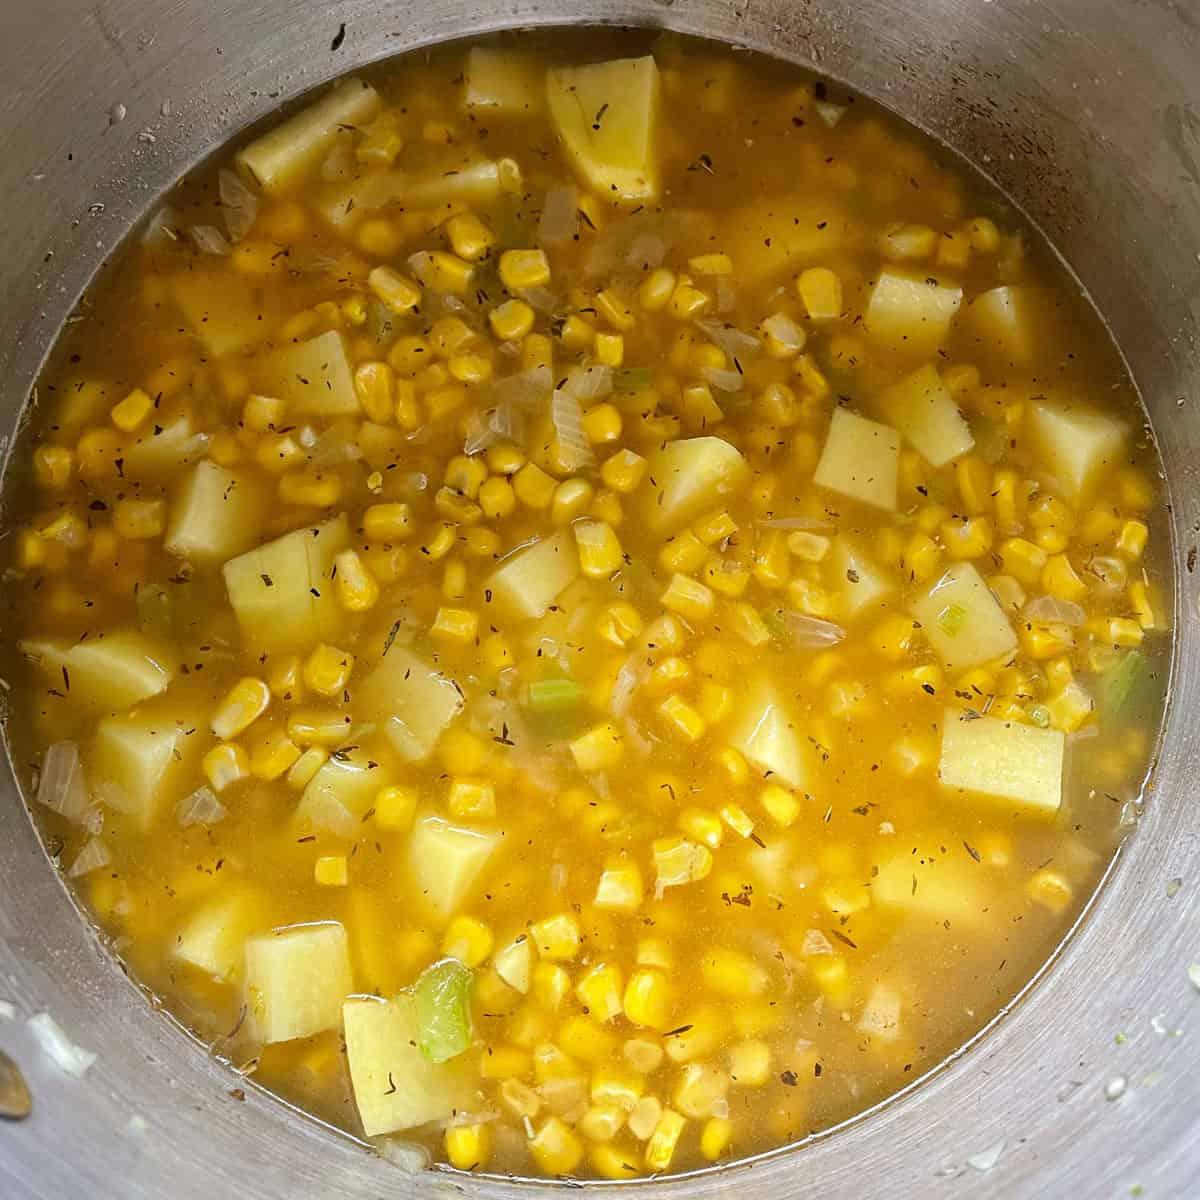 Corn and potato chowder cooking a large pot